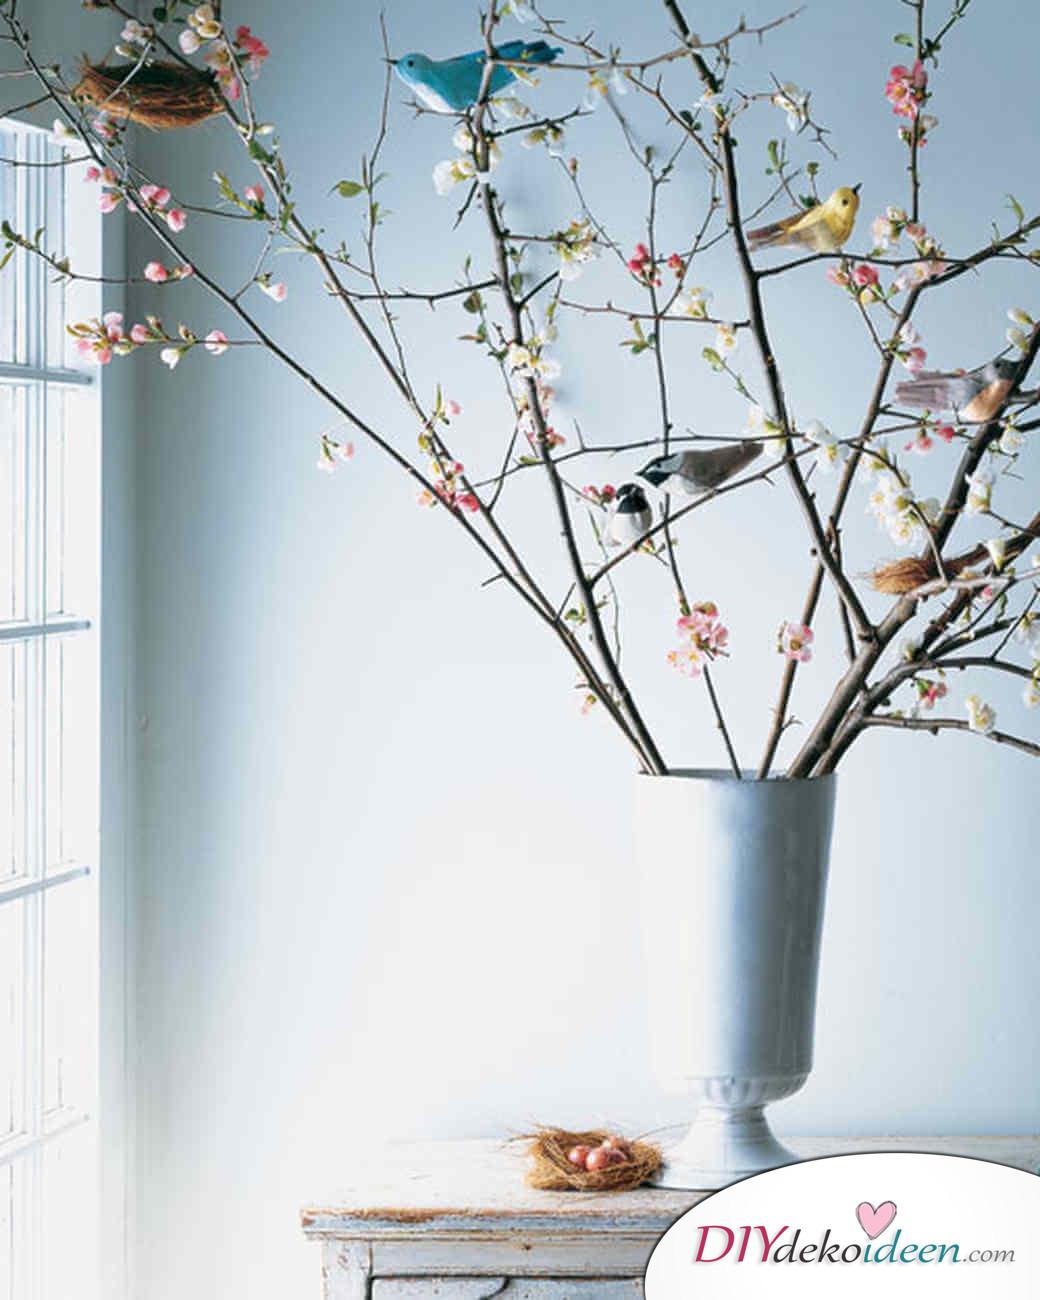 DIY Ideen - Frühlingsdeko selbst gestalten - Kleine Vögel